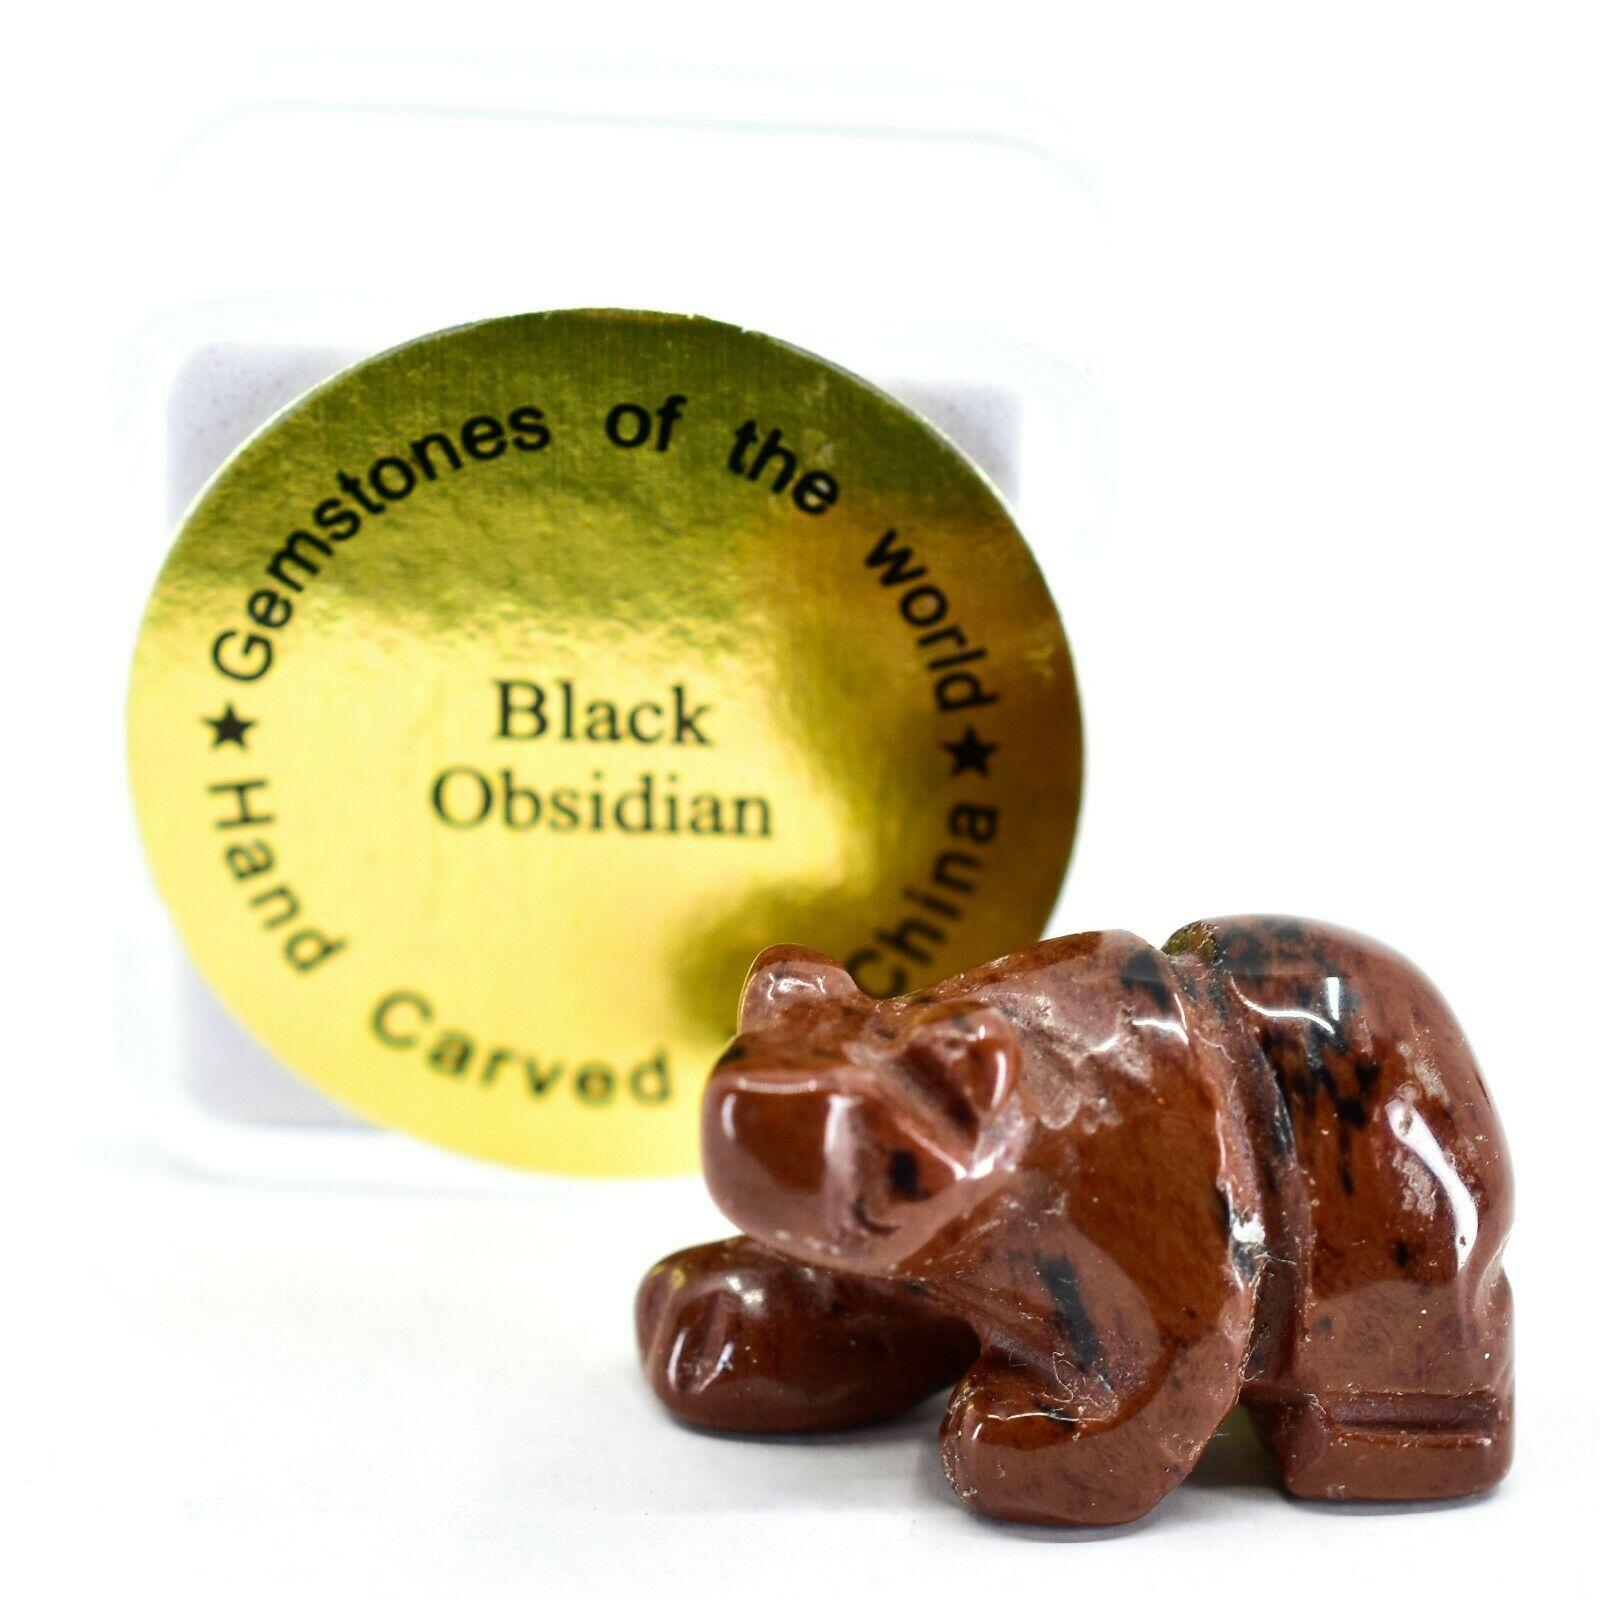 Red Black Obsidian Gemstone Tiny Miniature Bear Figurine Hand Carved China